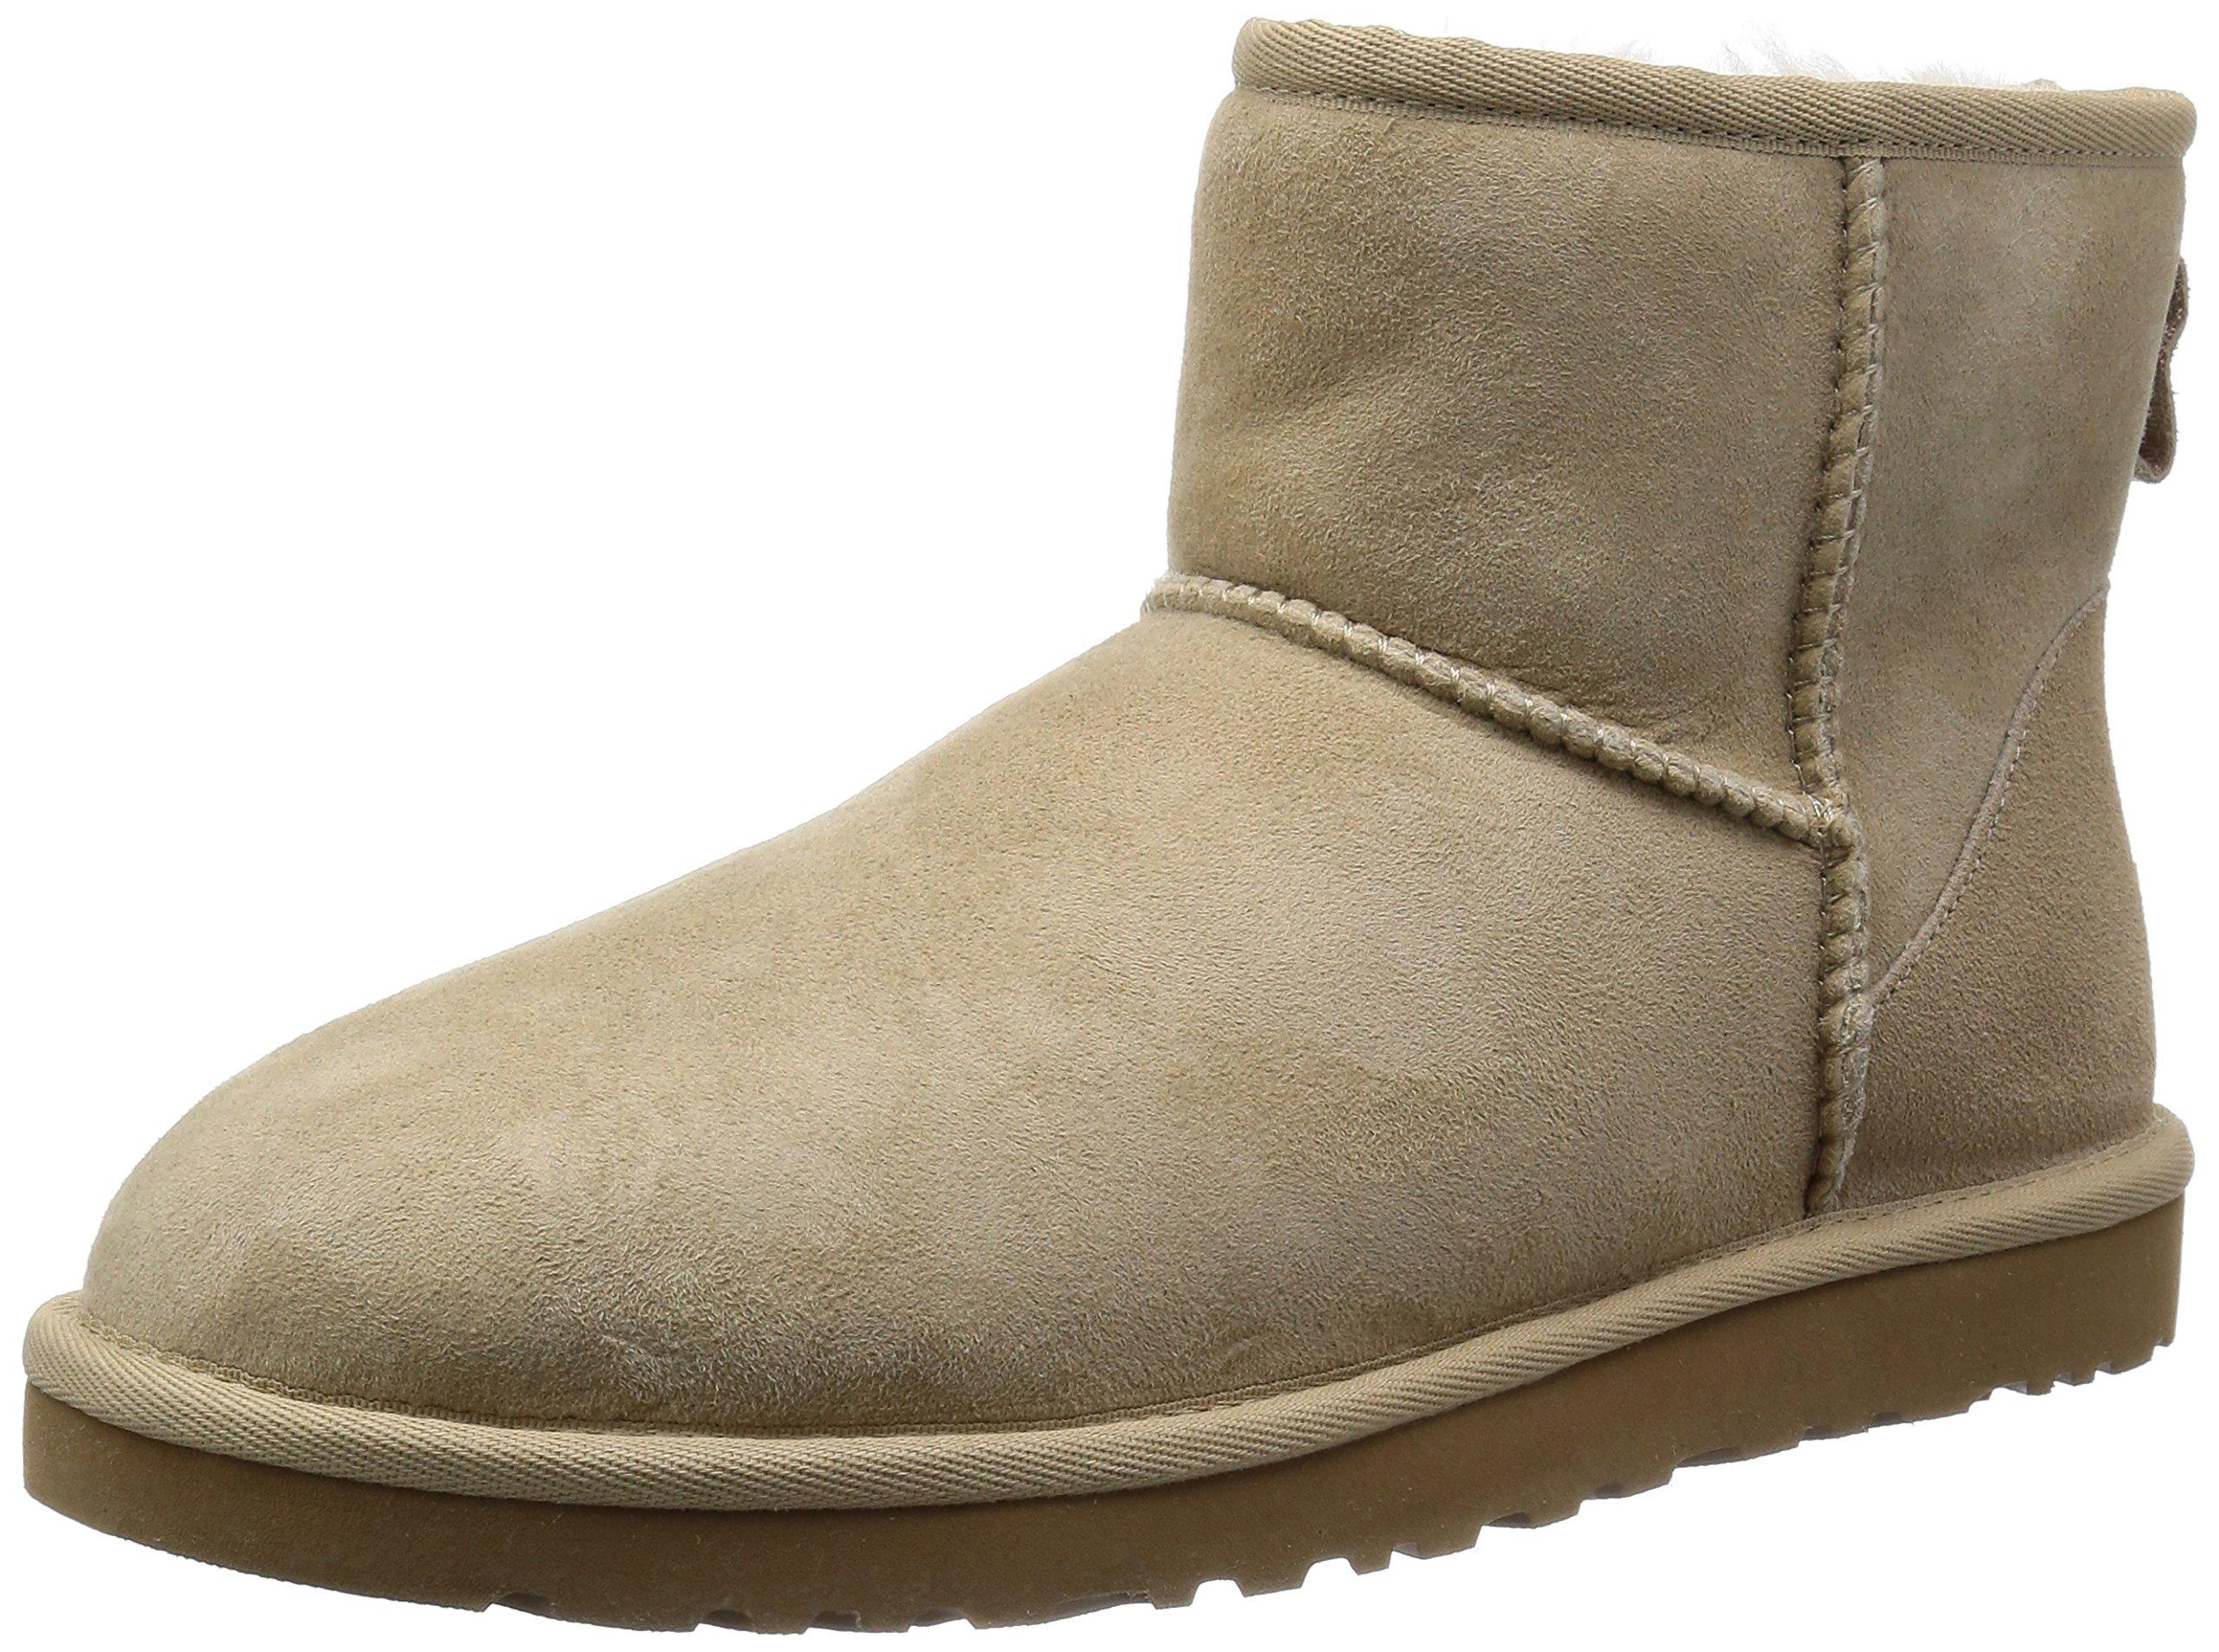 UGG Australia Womens Classic Mini Boot Sand Size 7